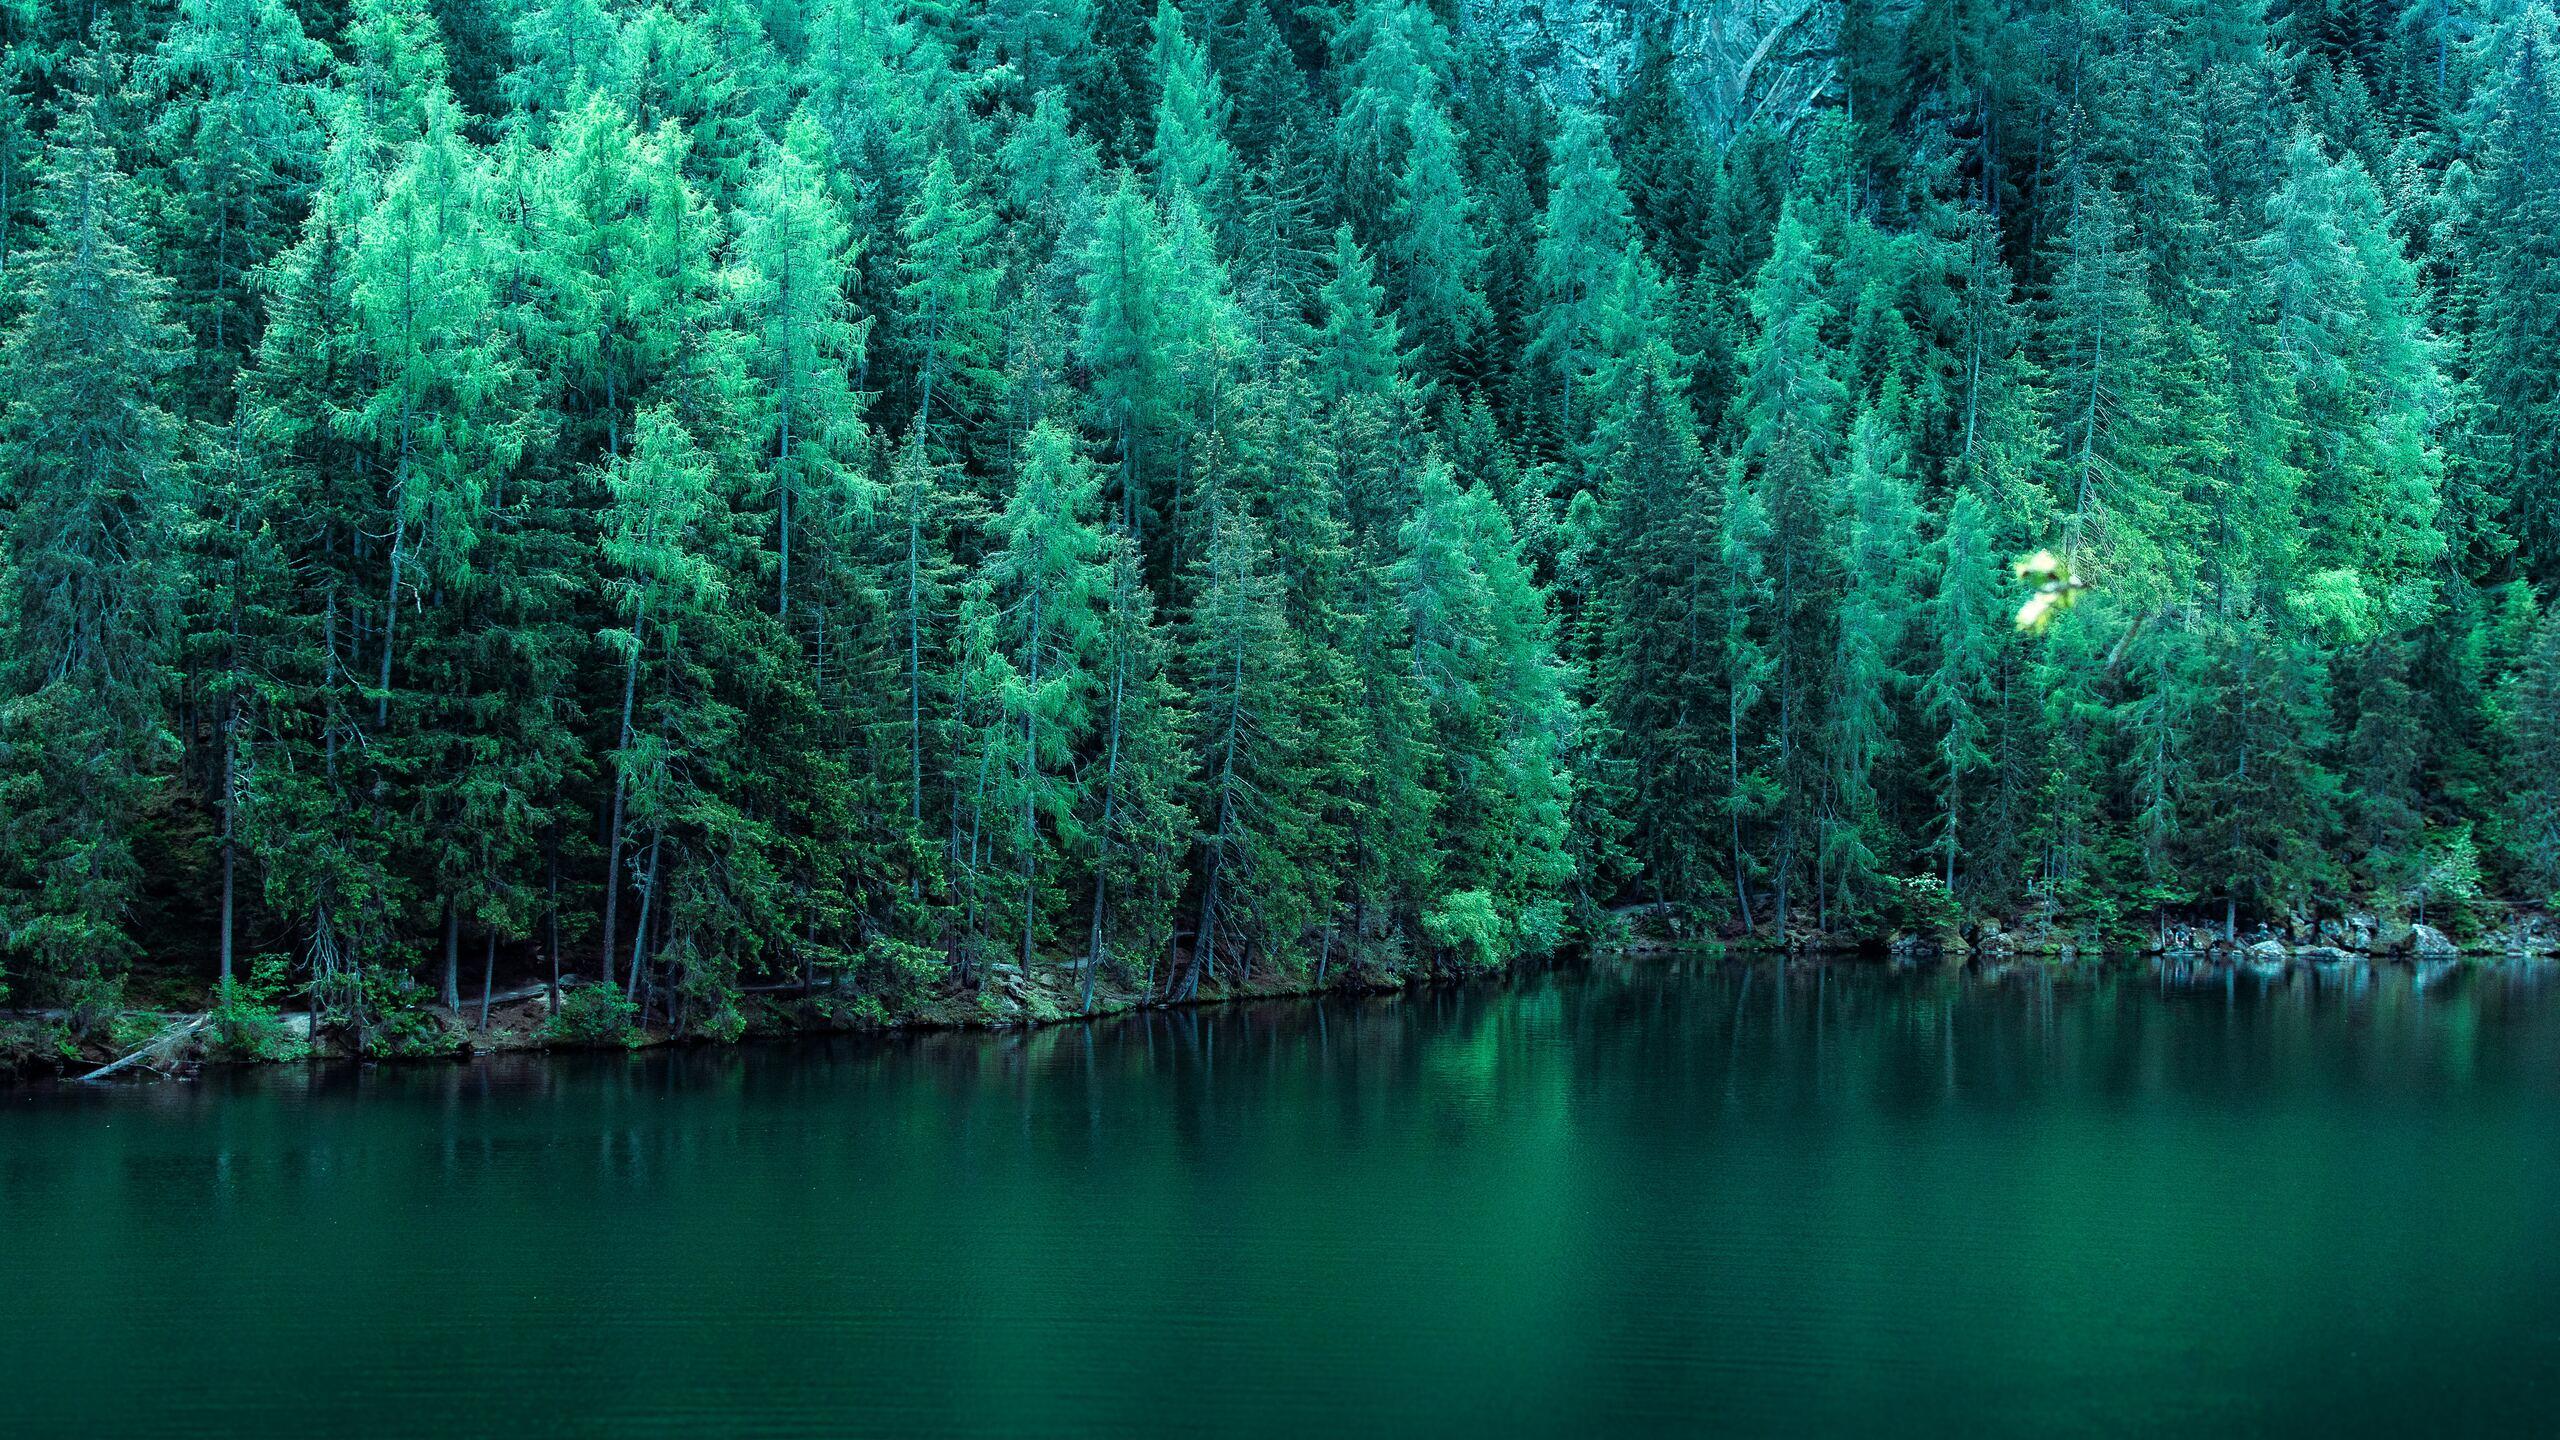 pine-trees-along-lake-5k-jf.jpg